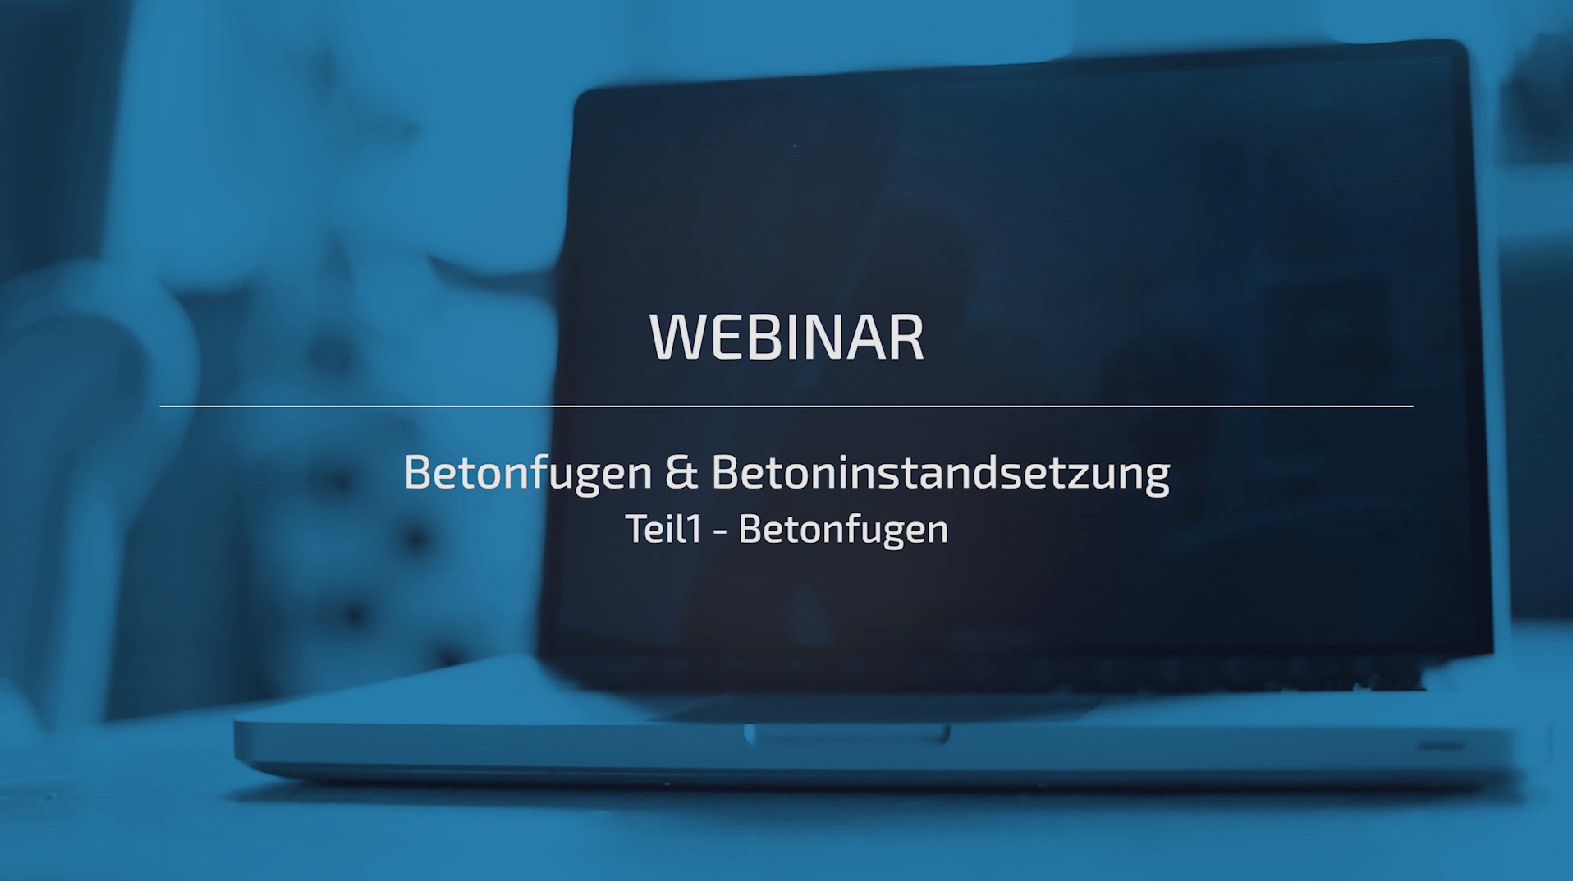 Webinar - Betonfugen & Betoninstandsetzung <br> Teil 1